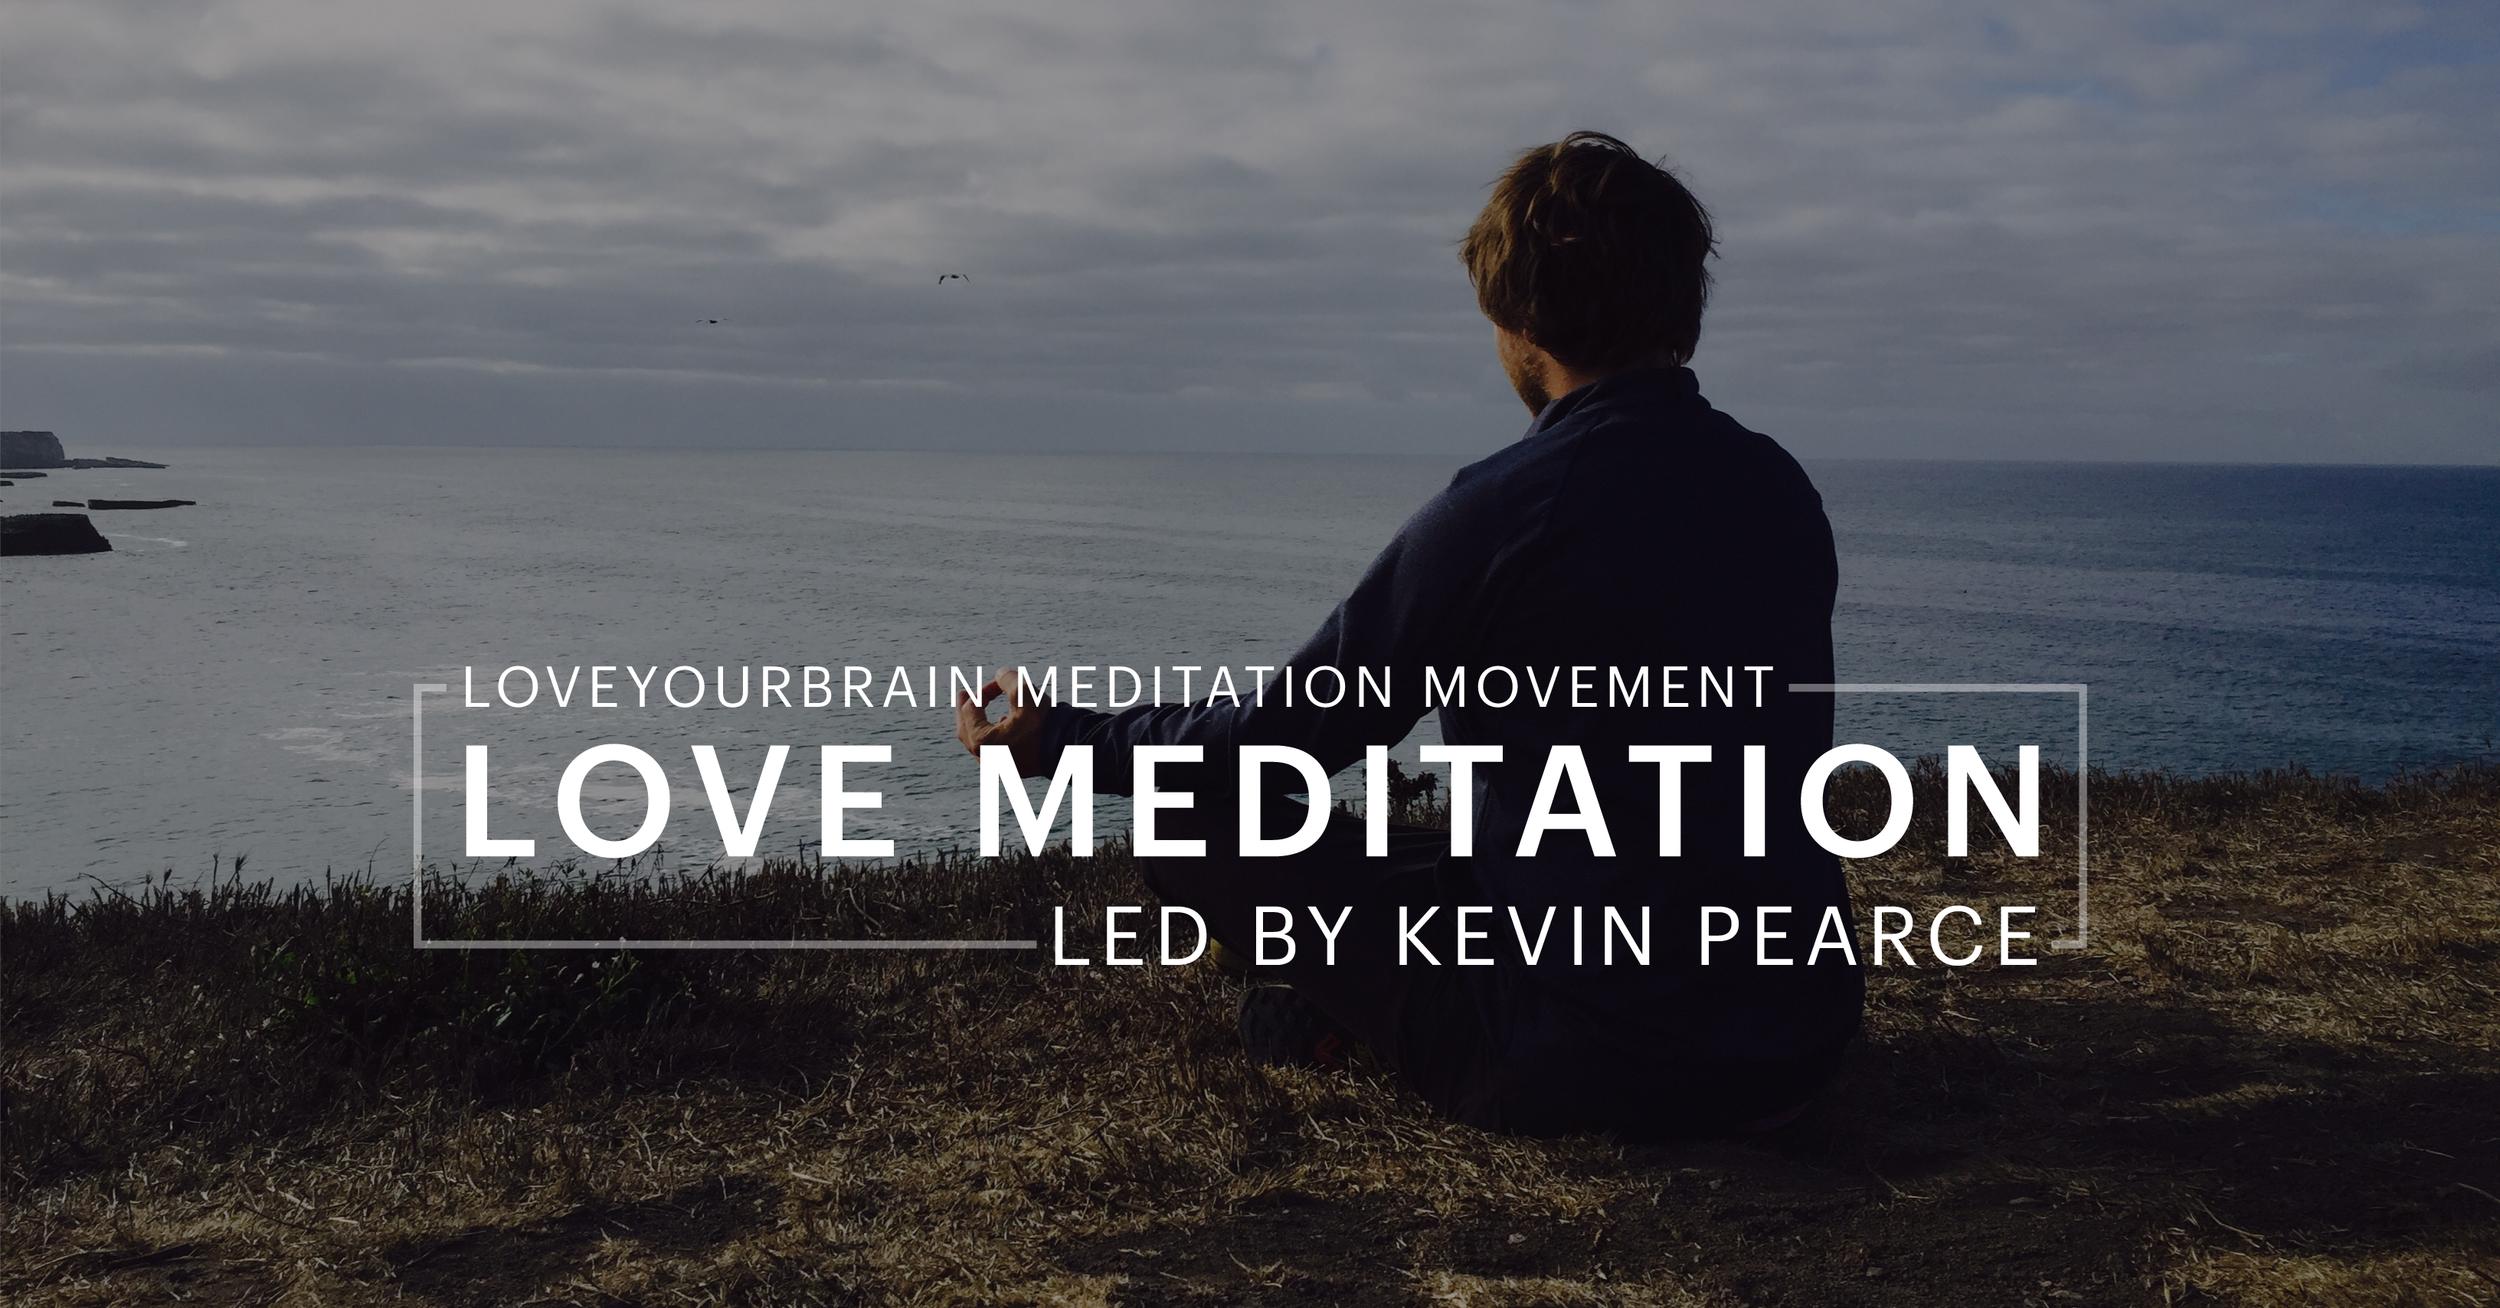 Love-Meditation-KevinPearce.jpg